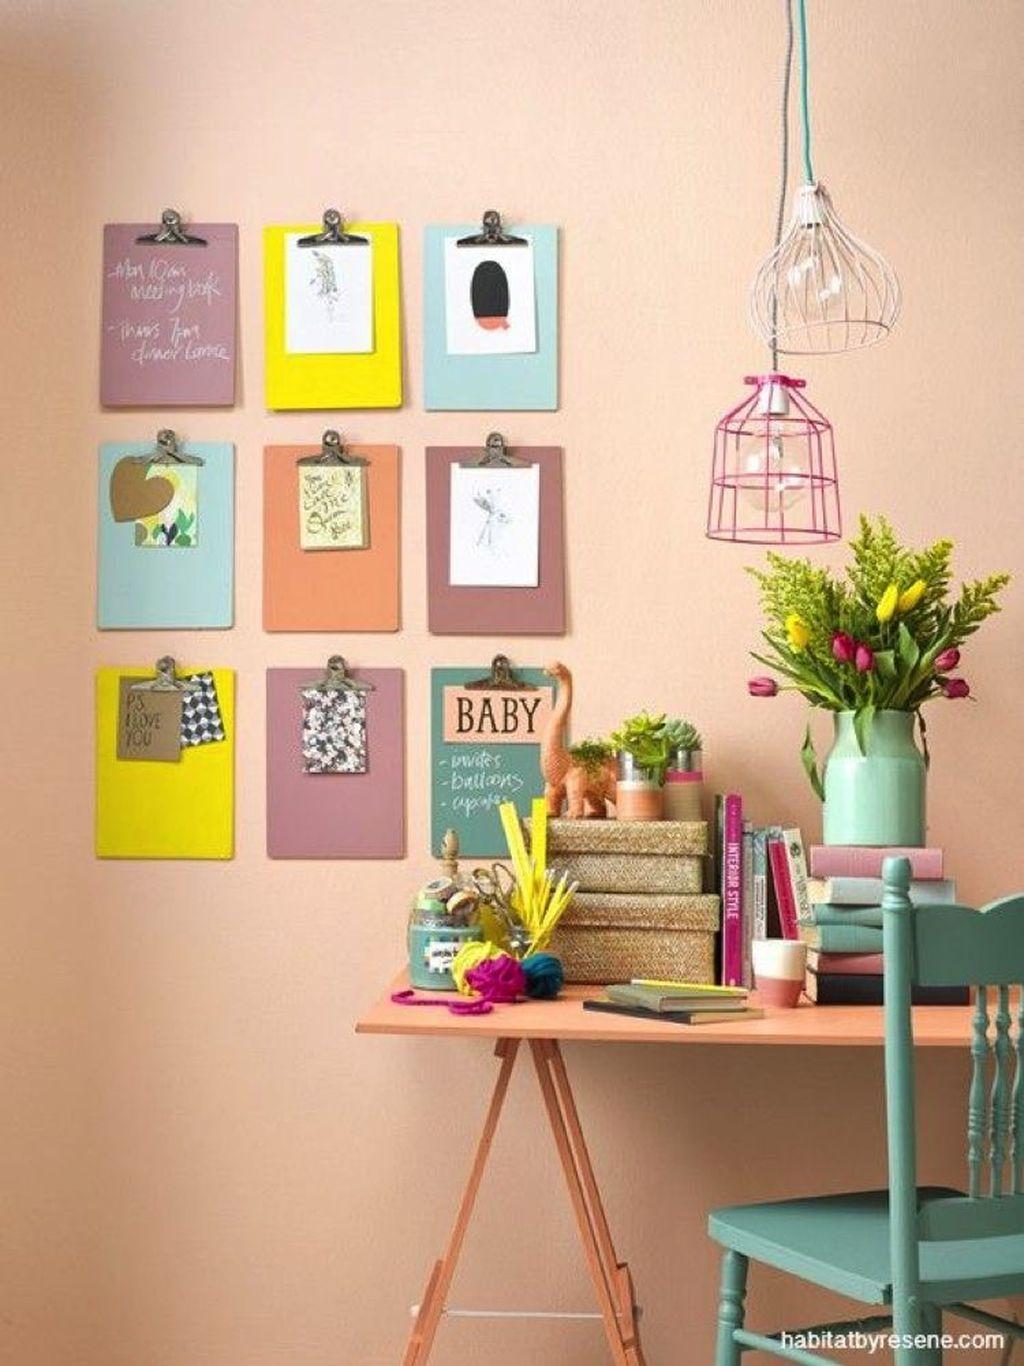 The Best Office Artwork Design Ideas 20